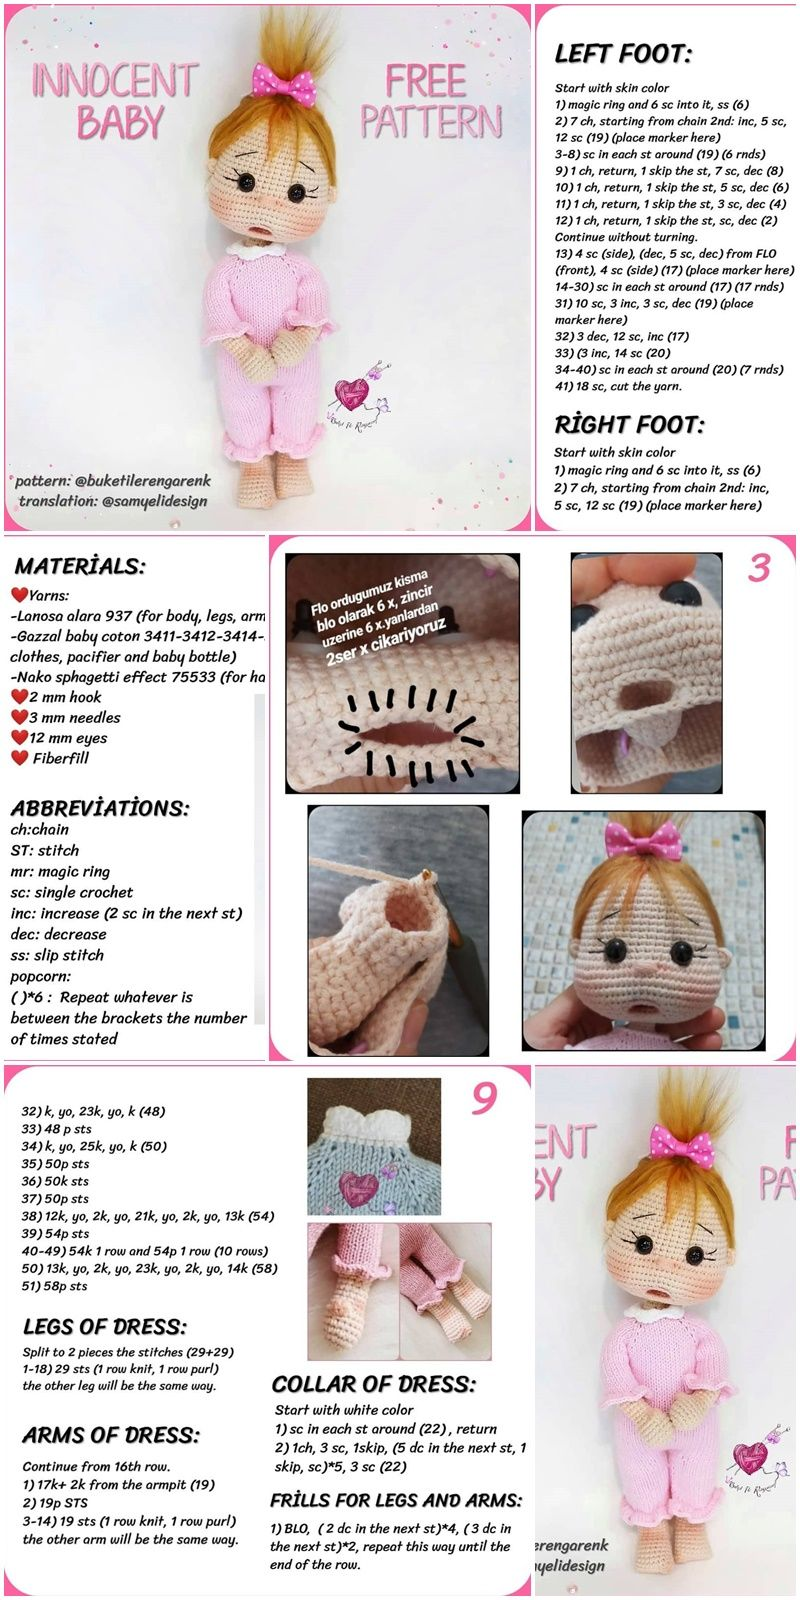 Amigurumi Doll İnnocent Baby Free Crochet Pattern - Örgü Modelleri #amigurumimodelleri